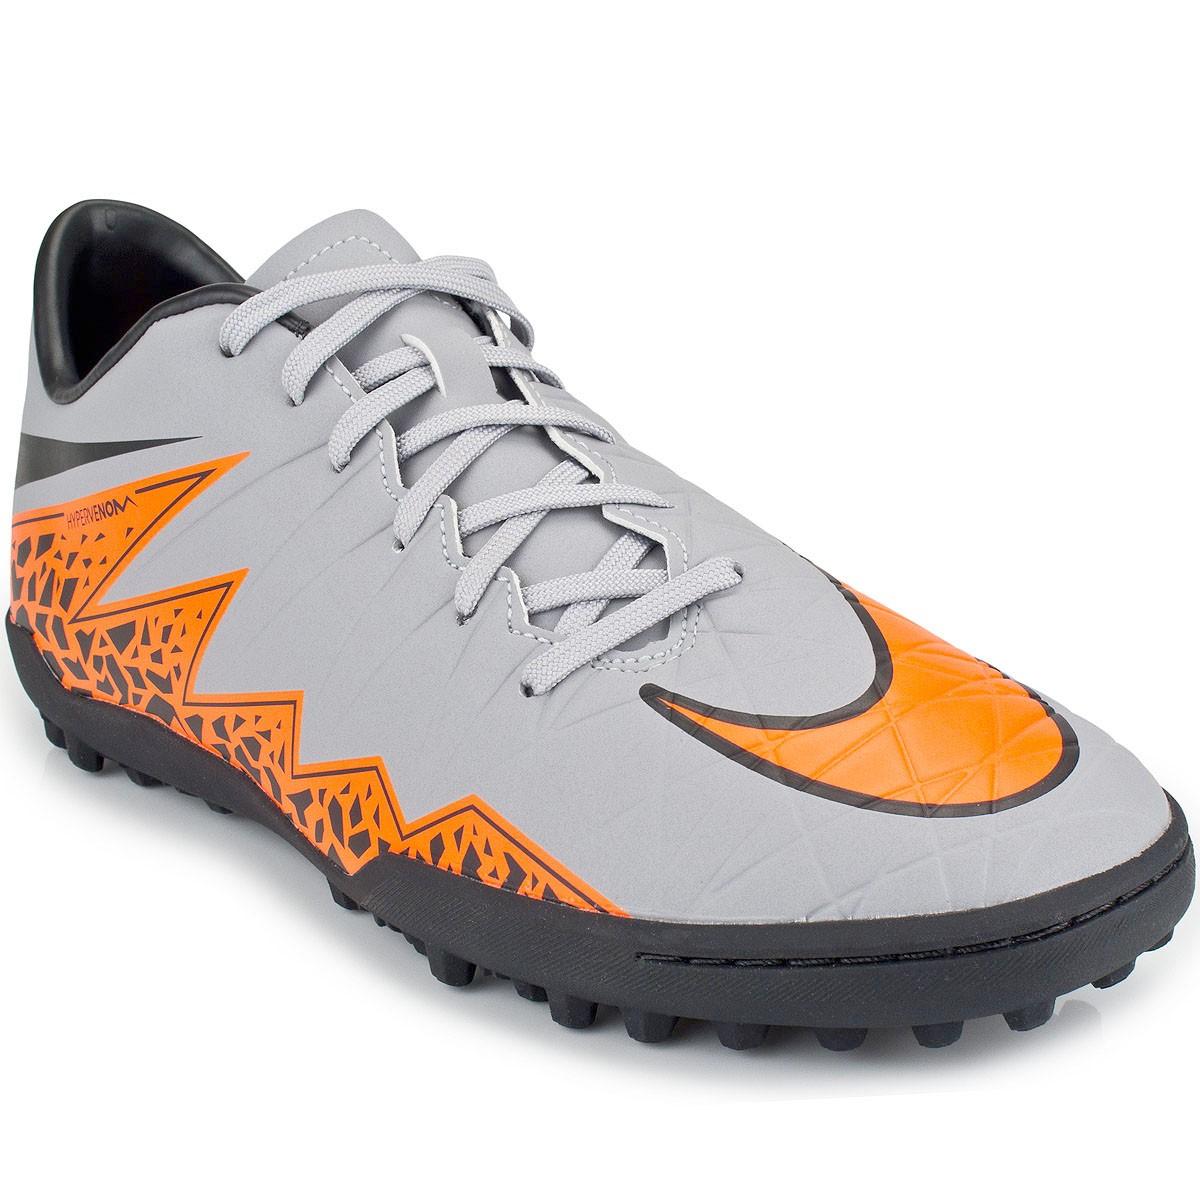 9b28617591ba4 Chuteira Nike Hypervenom Phelon II TF | Society | MaxTennis